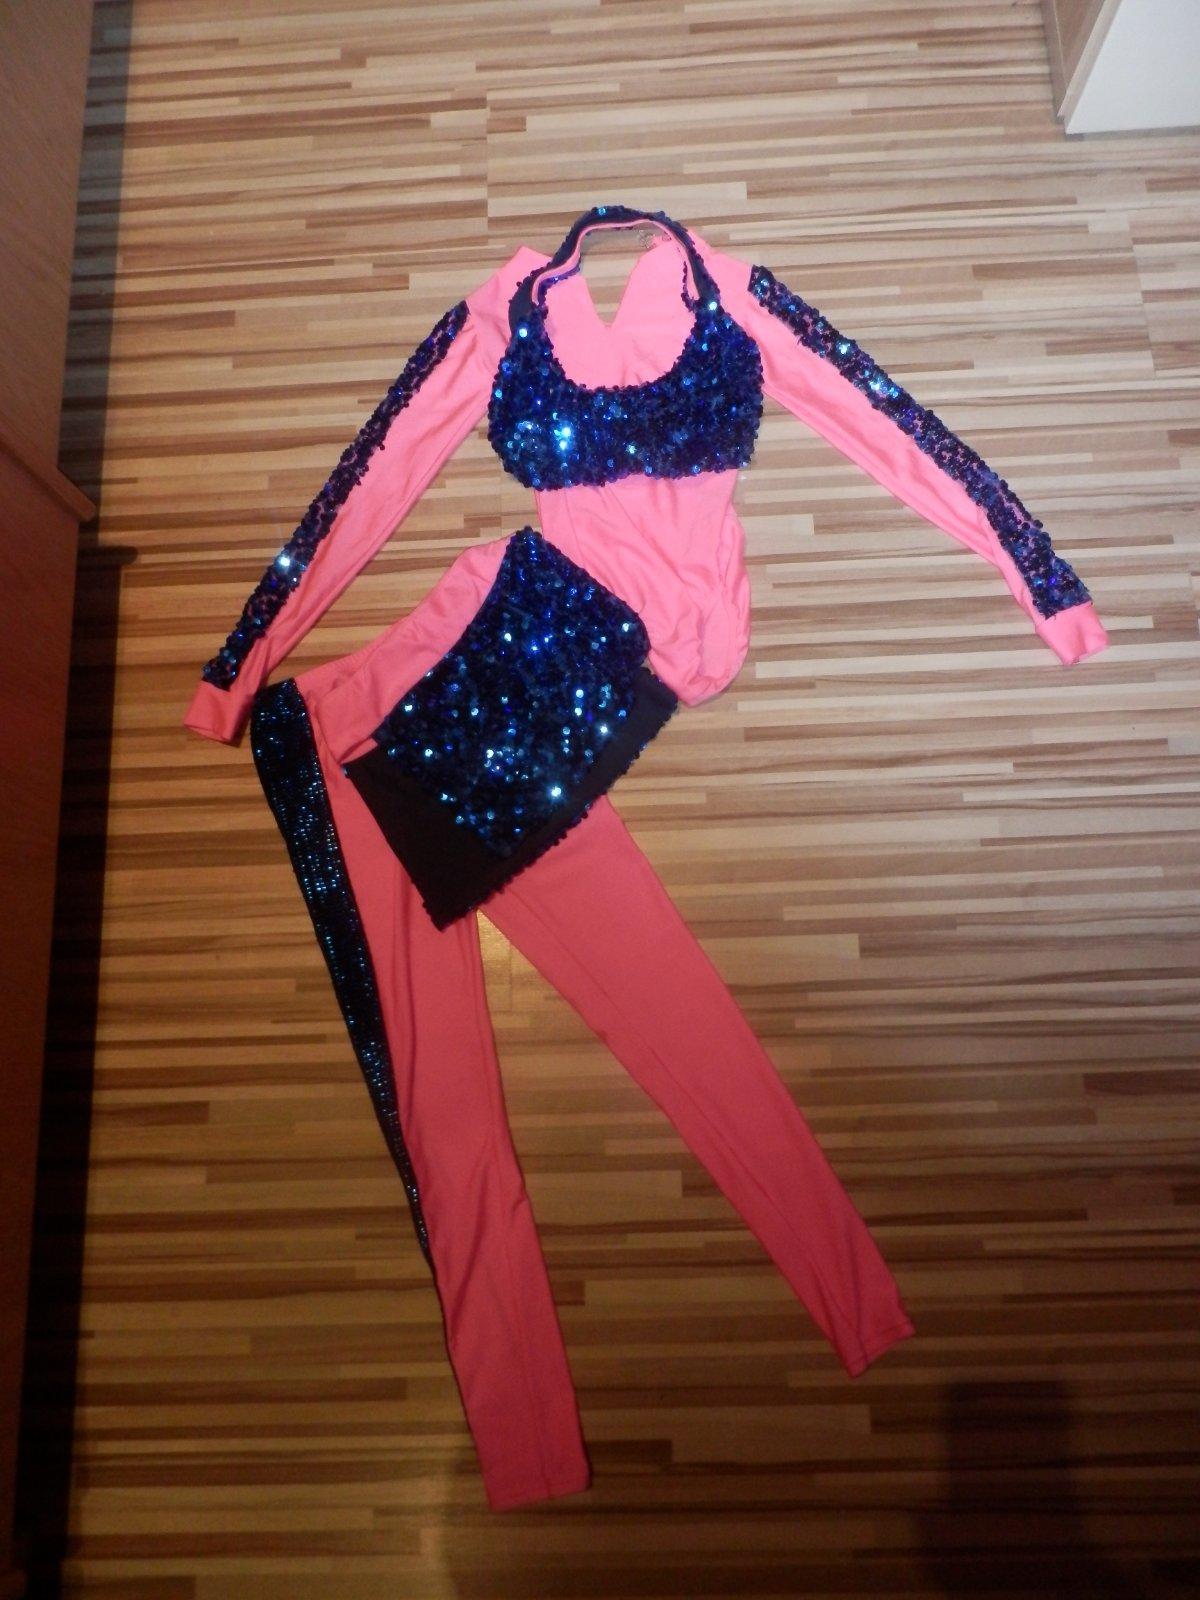 Sutazny kostym na disco tanec 128-140 f4262d241c0